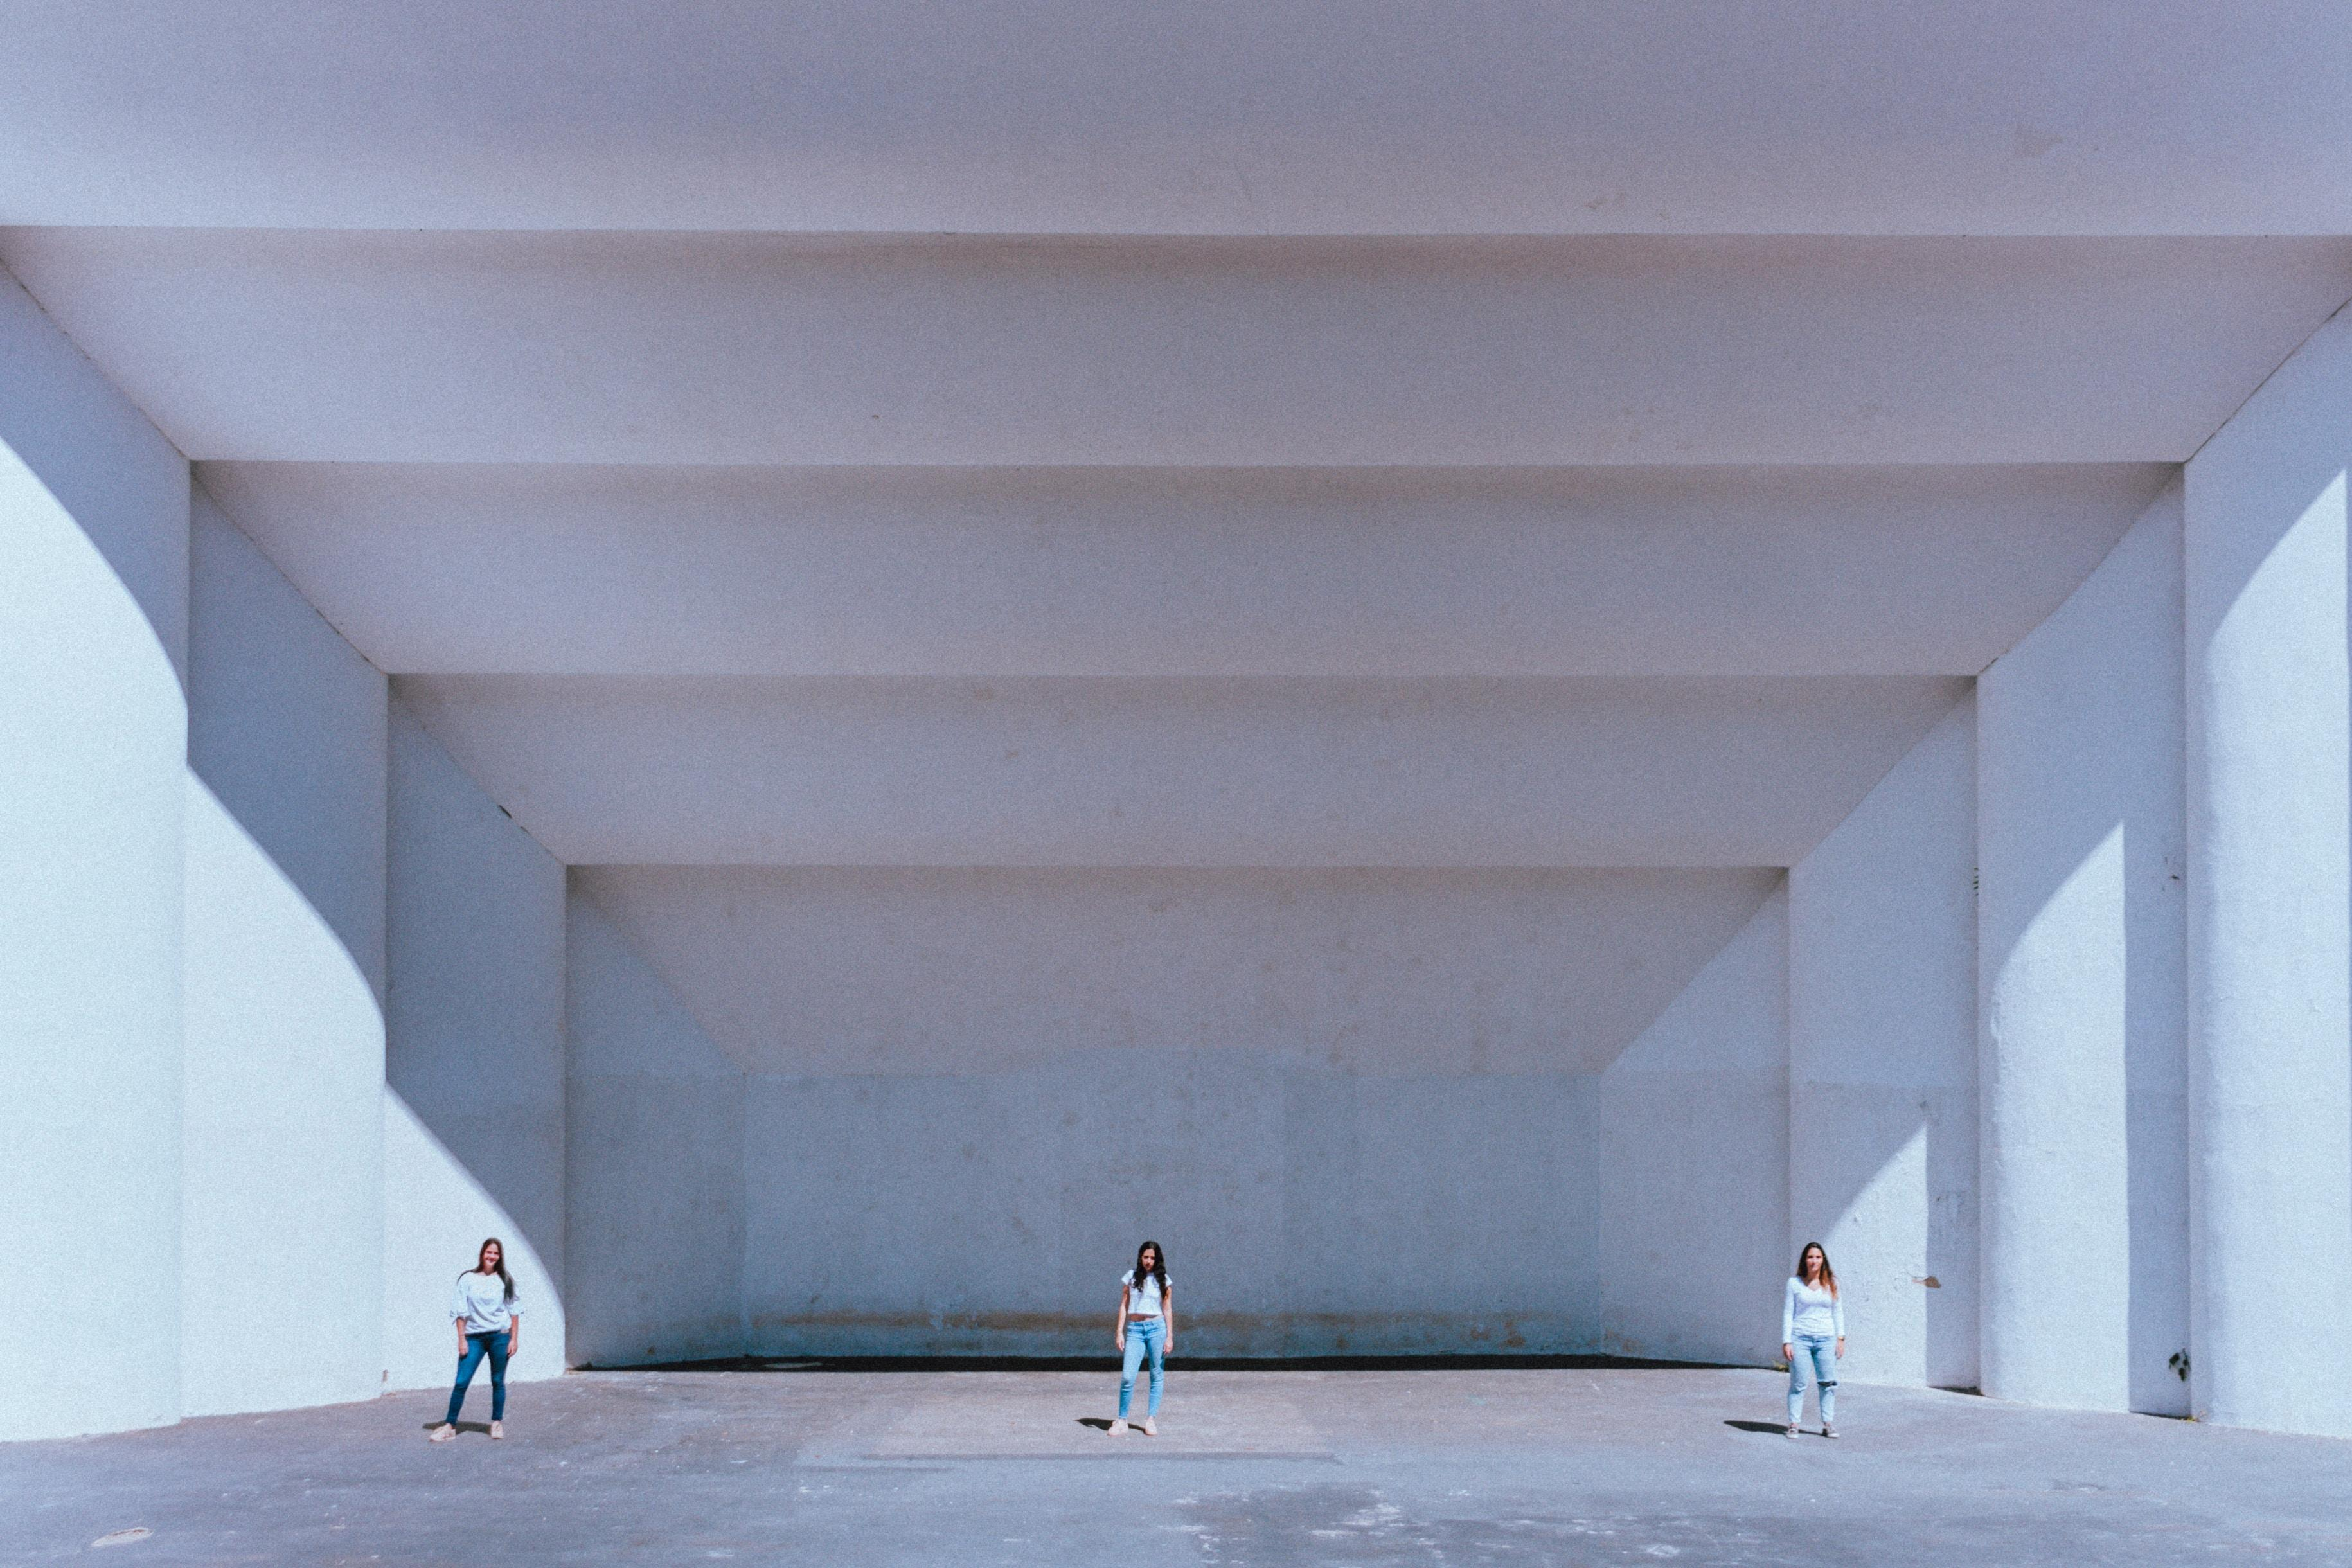 Seminario ?Urbanismo y género: ¿existe el urbanismo feminista??